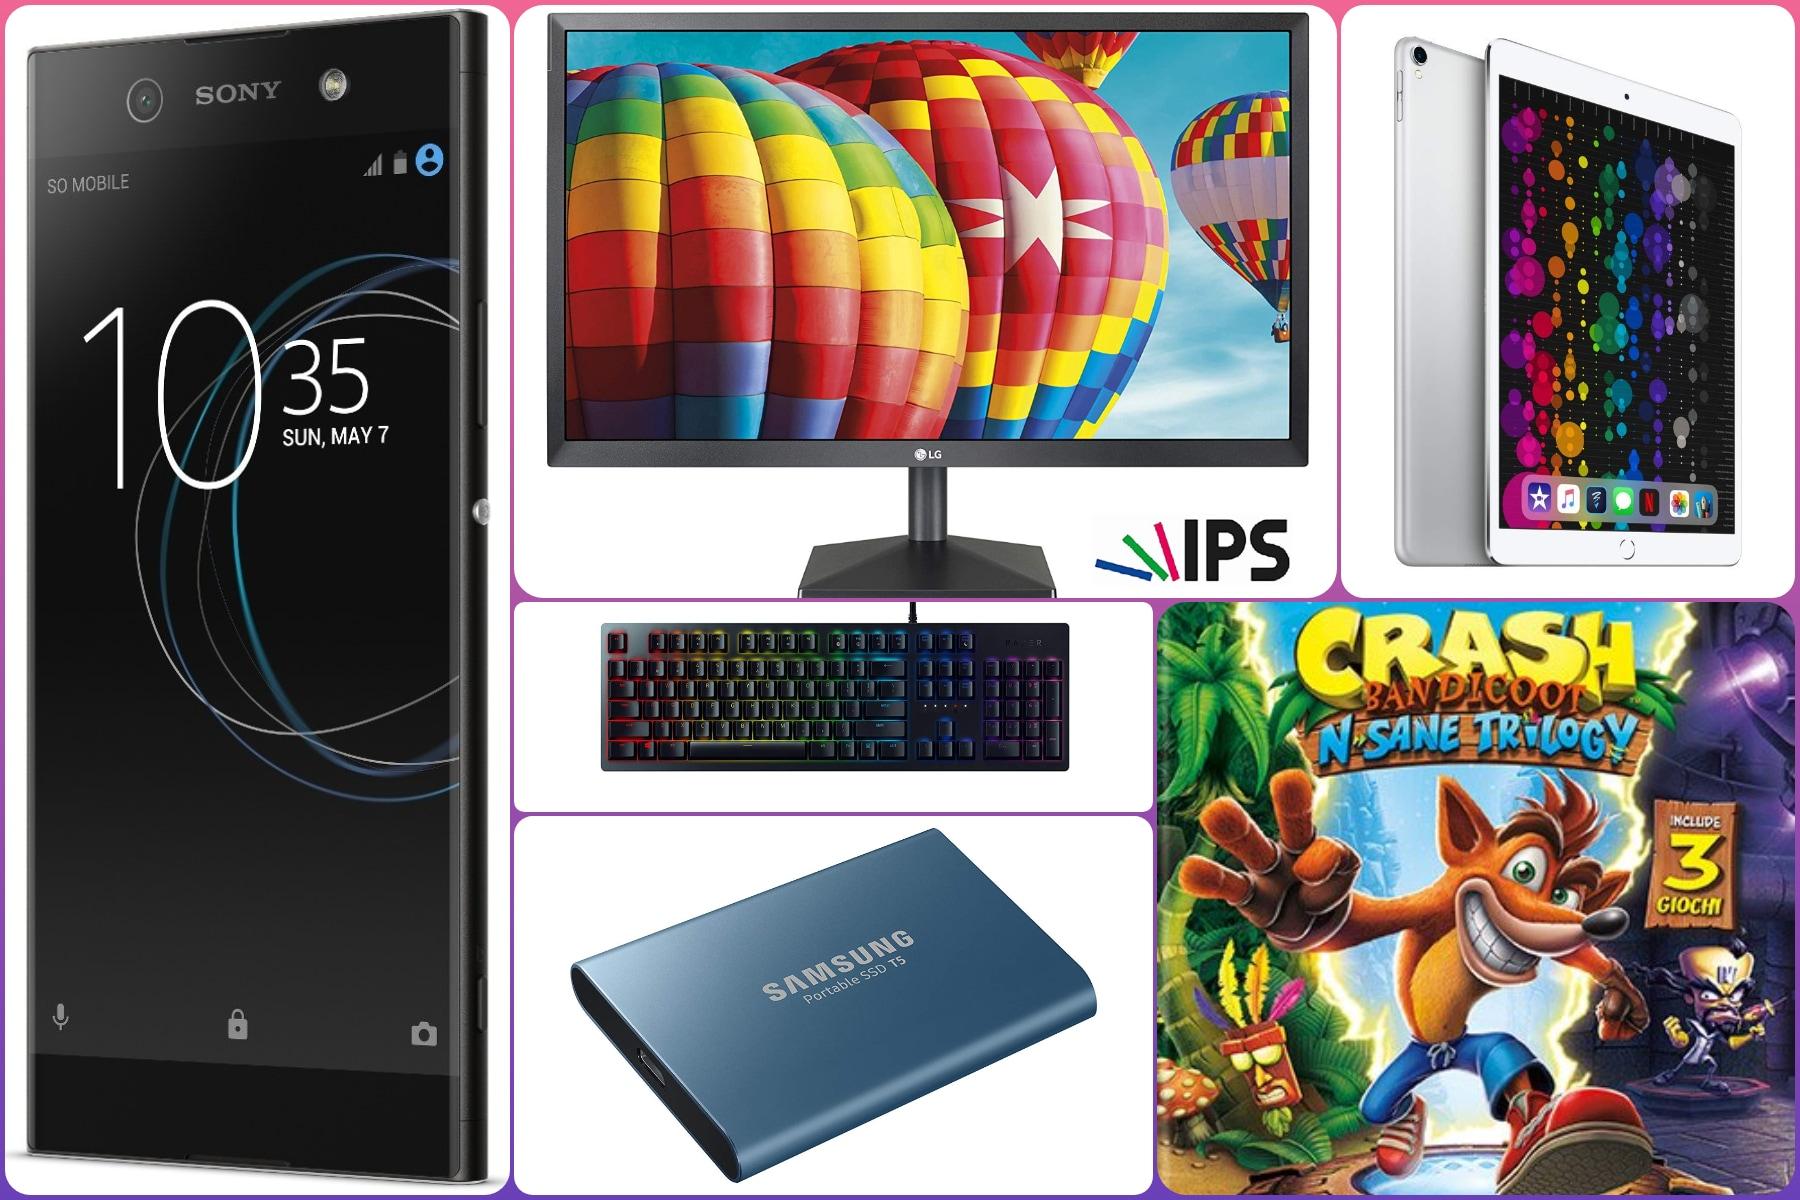 Huawei P30 e P30 Pro ufficiali: video anteprima - image Migliori-offerte-Amazon-26-marzo-2019 on https://www.zxbyte.com